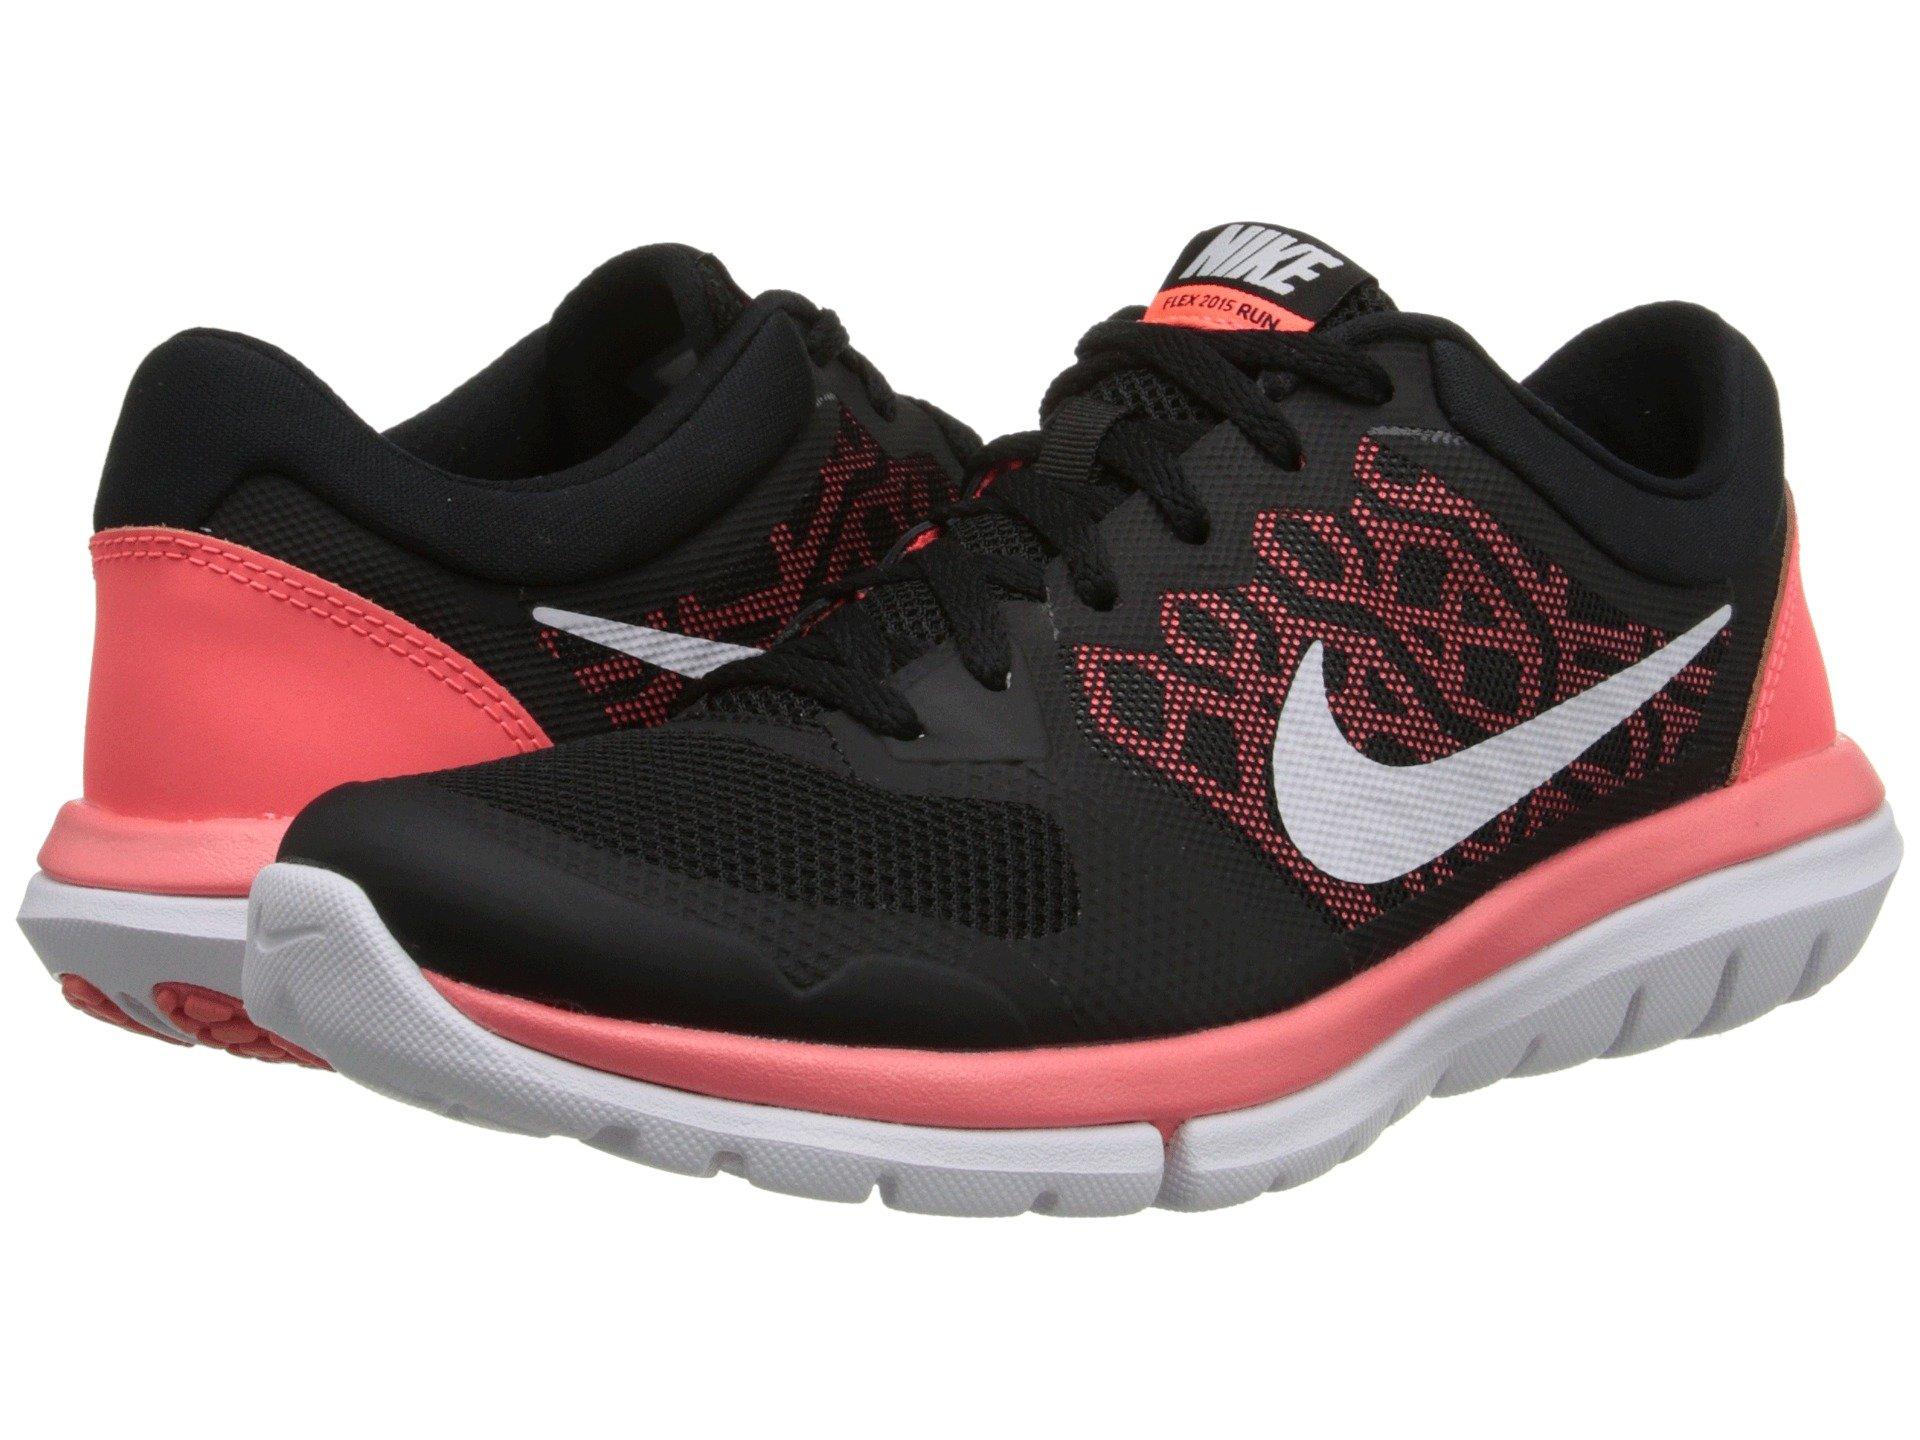 Cool Nike Free 5.0 (2015) - Womens Running Shoes - Black/Dark Grey/Cool Grey/White Online | Sportitude